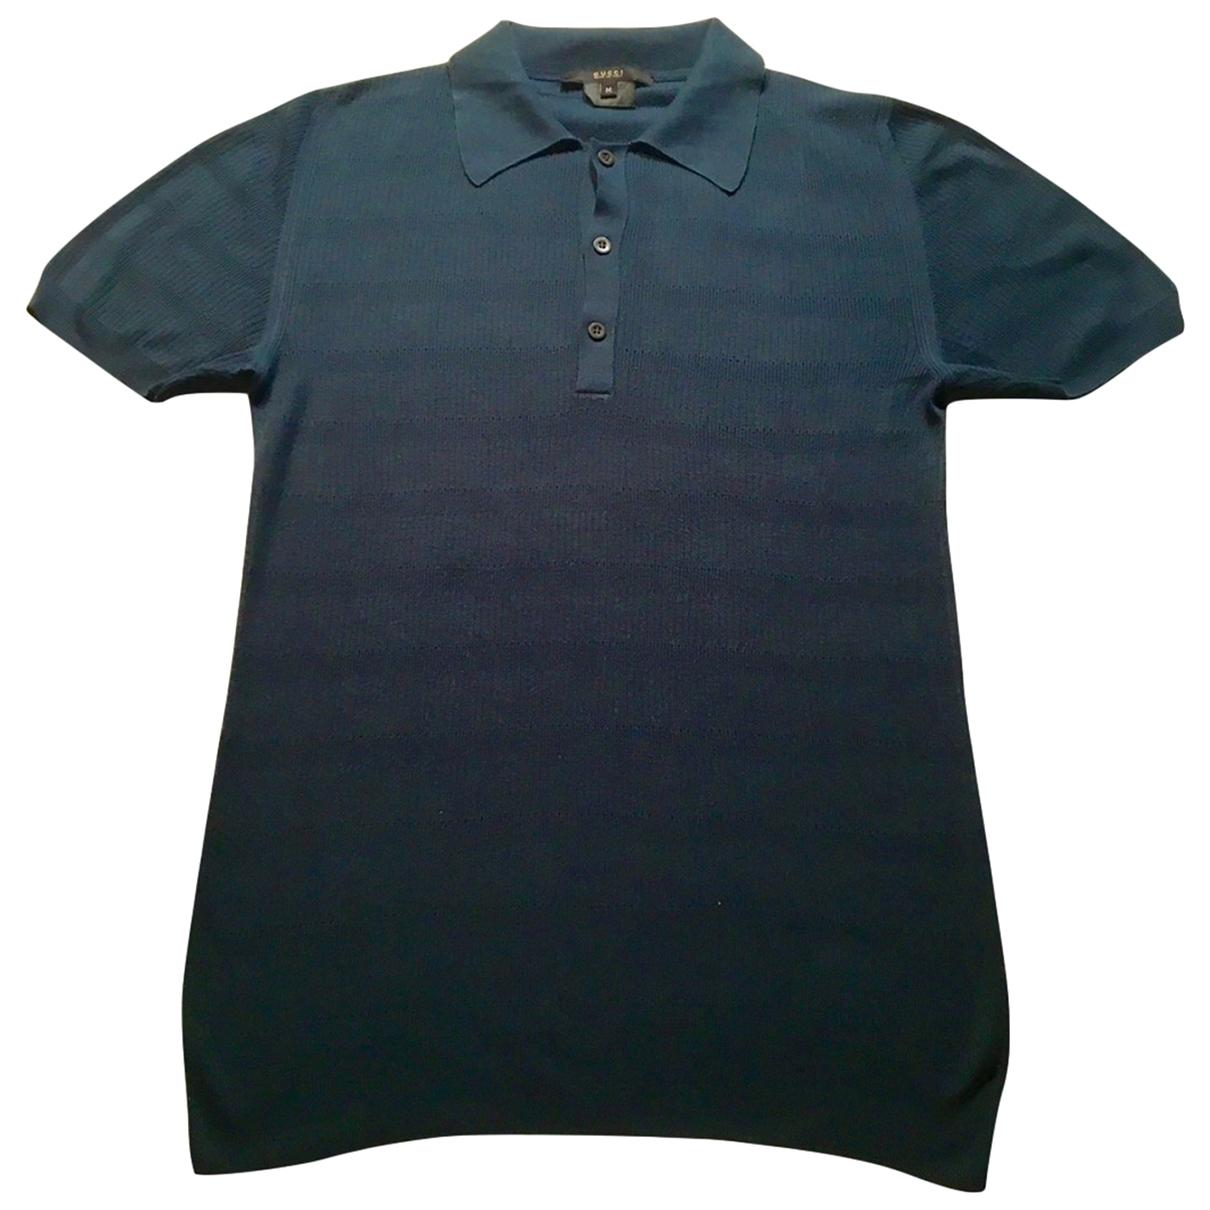 Gucci \N Green Cotton Polo shirts for Men M International